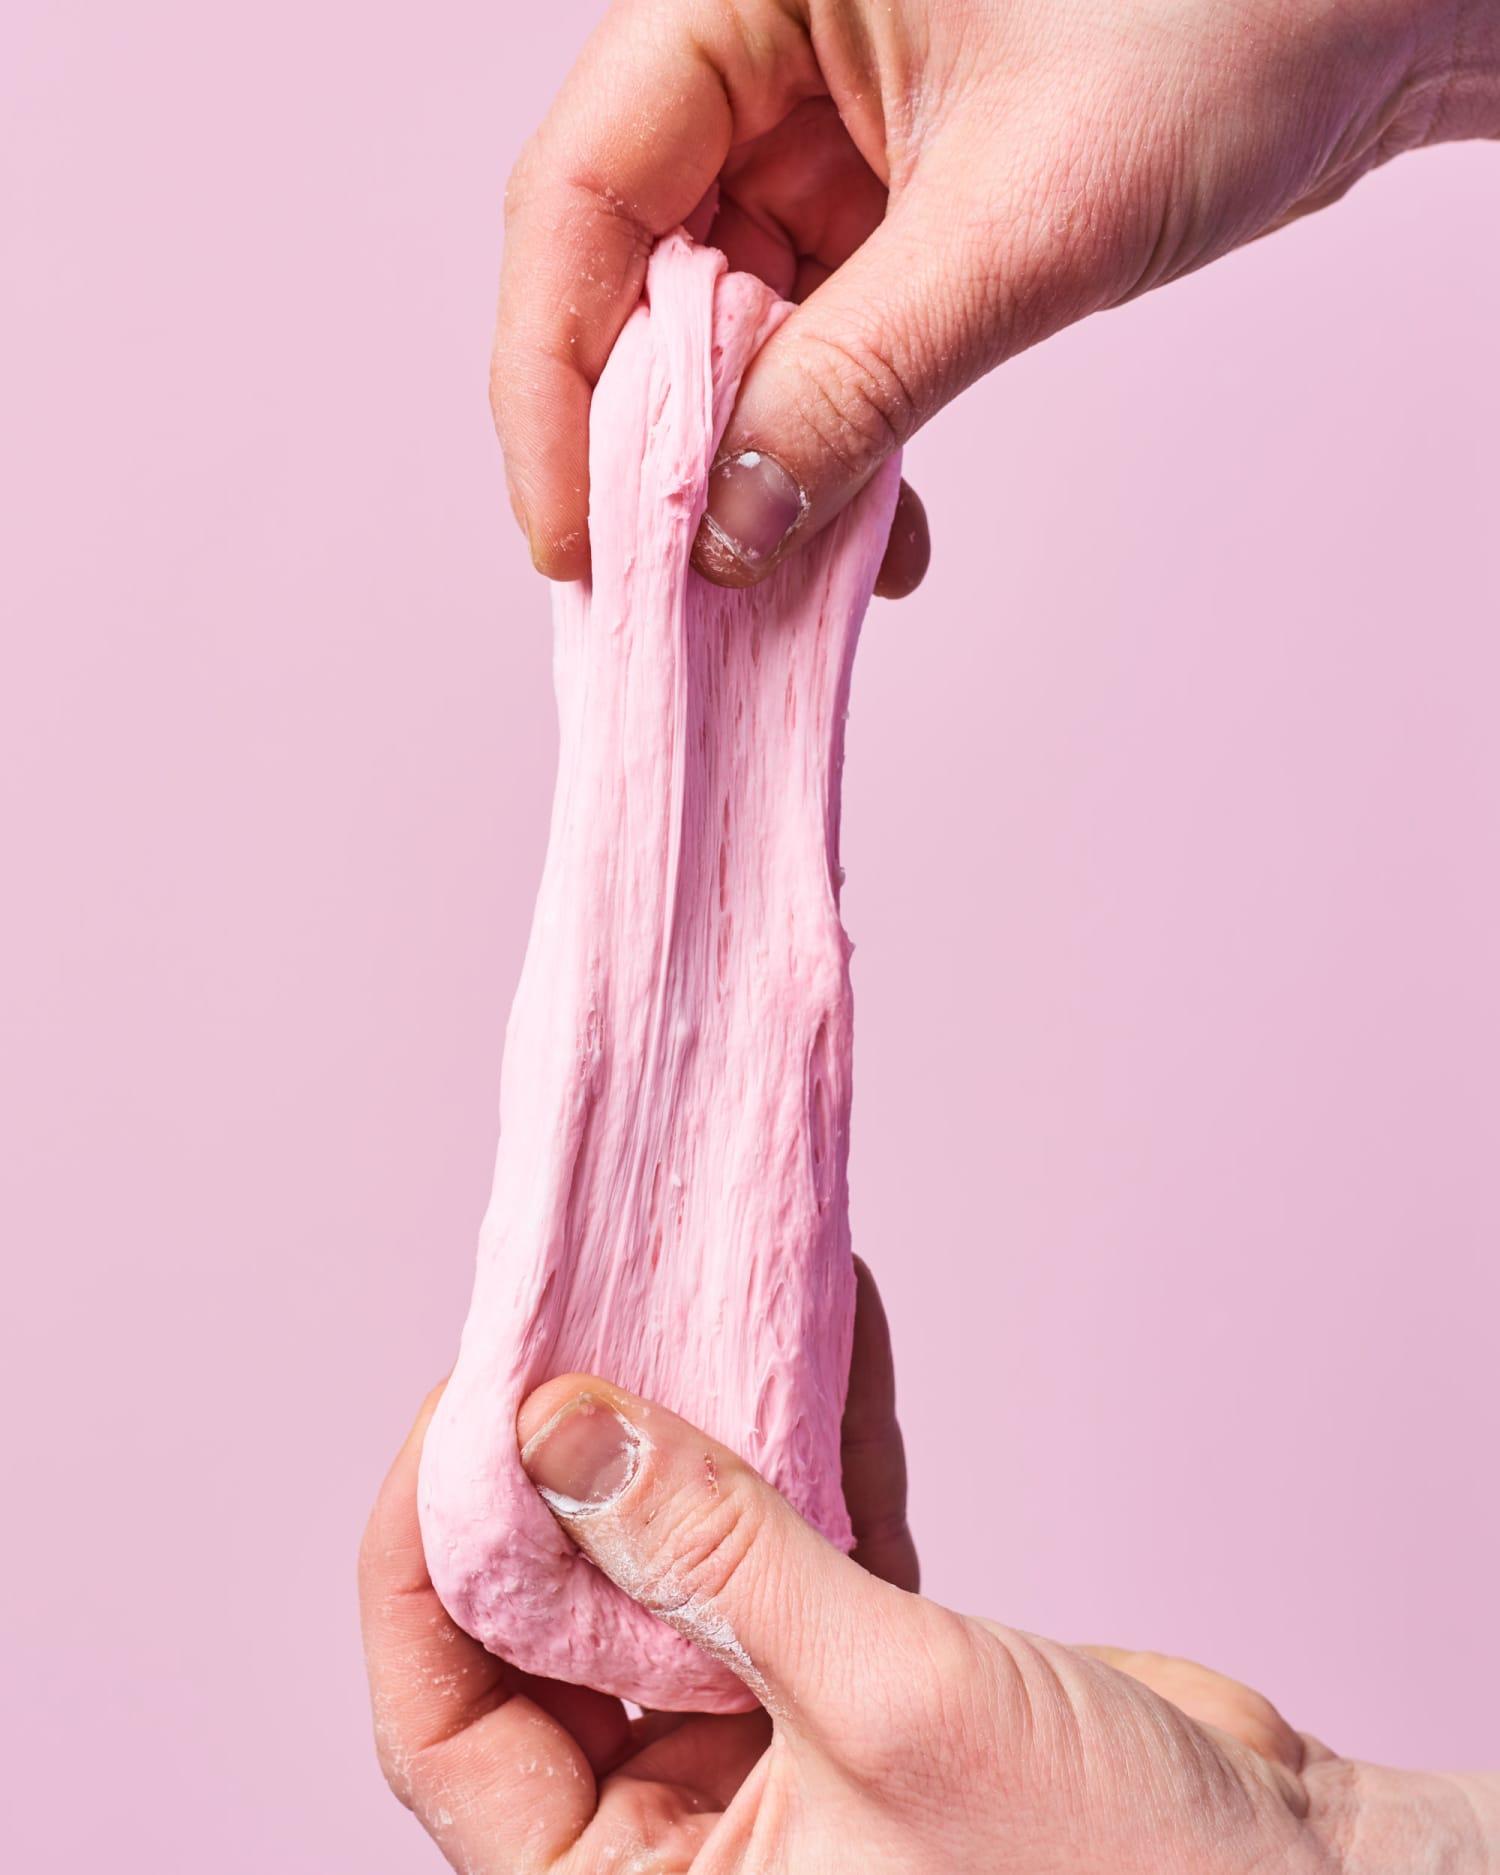 Why Make Slime When You Can Make Edible Playdough